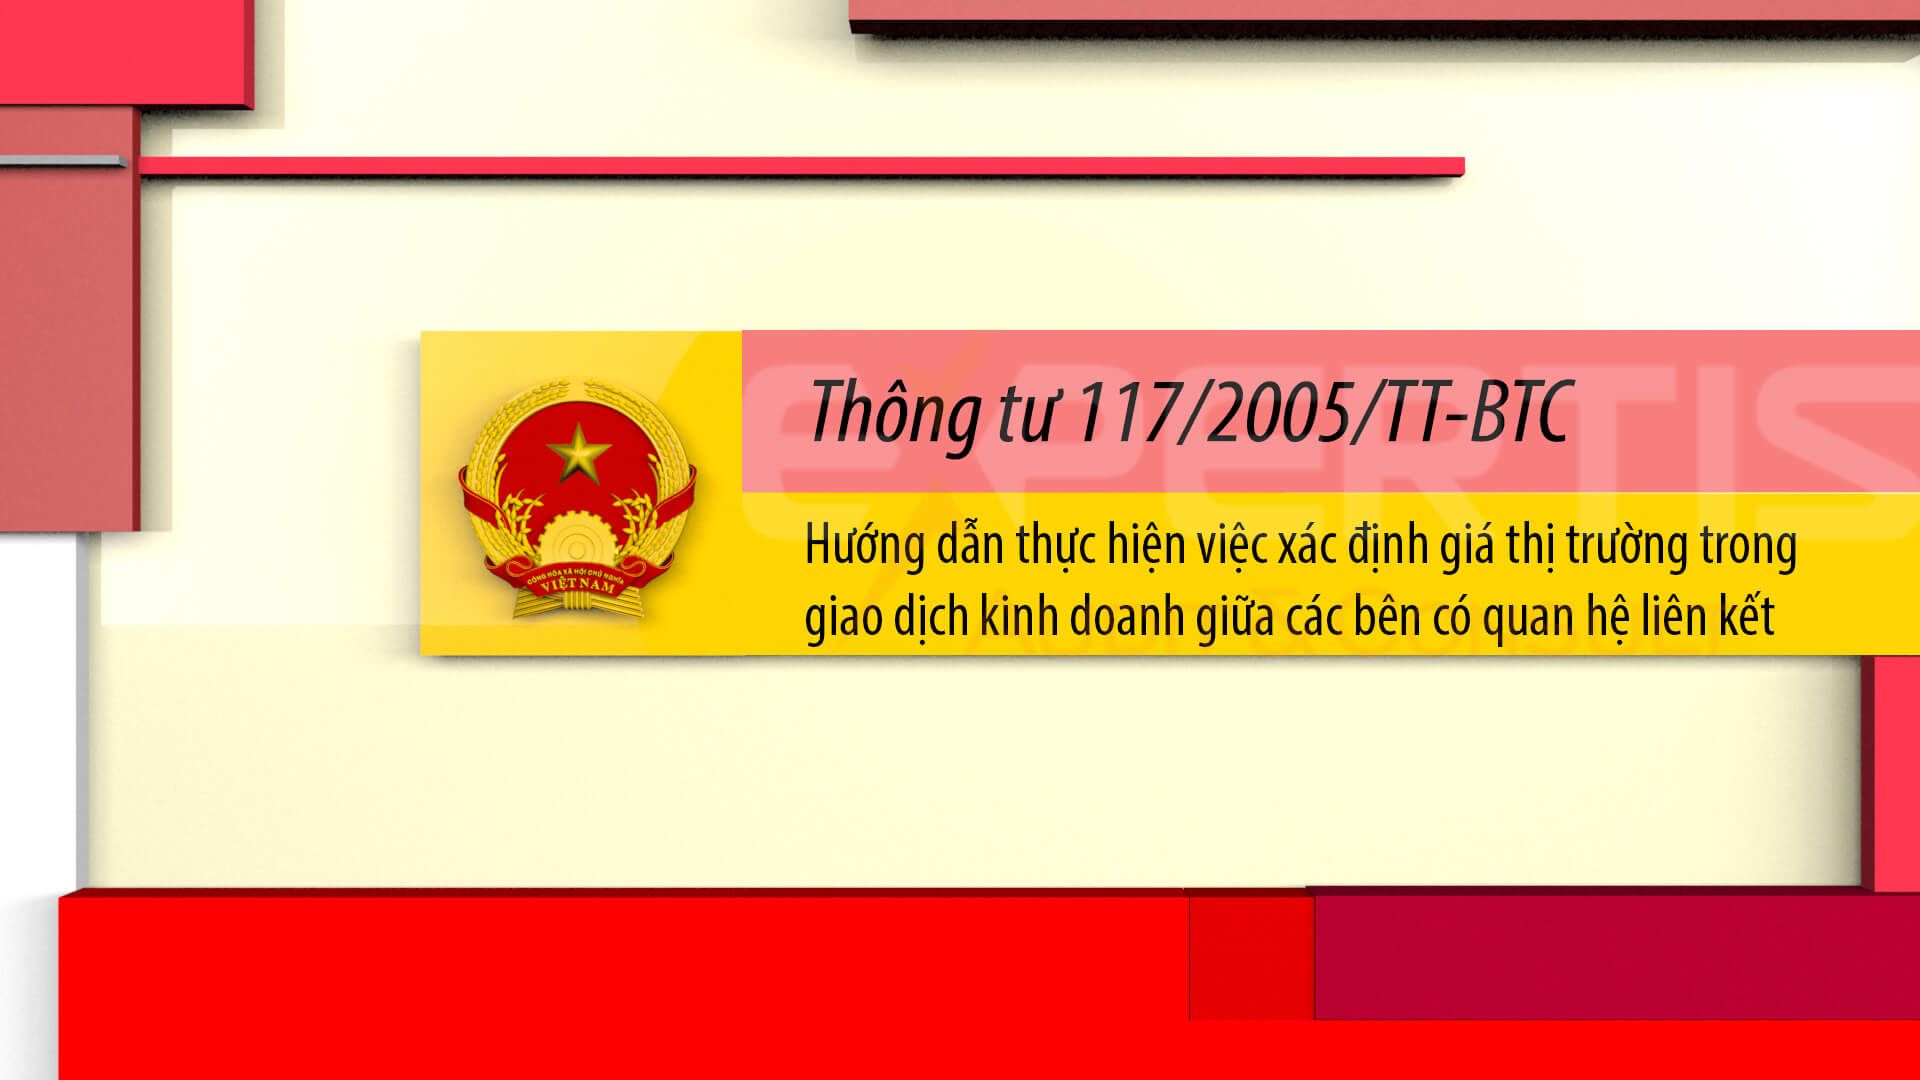 Thông tư 117/2005/TT-BTC